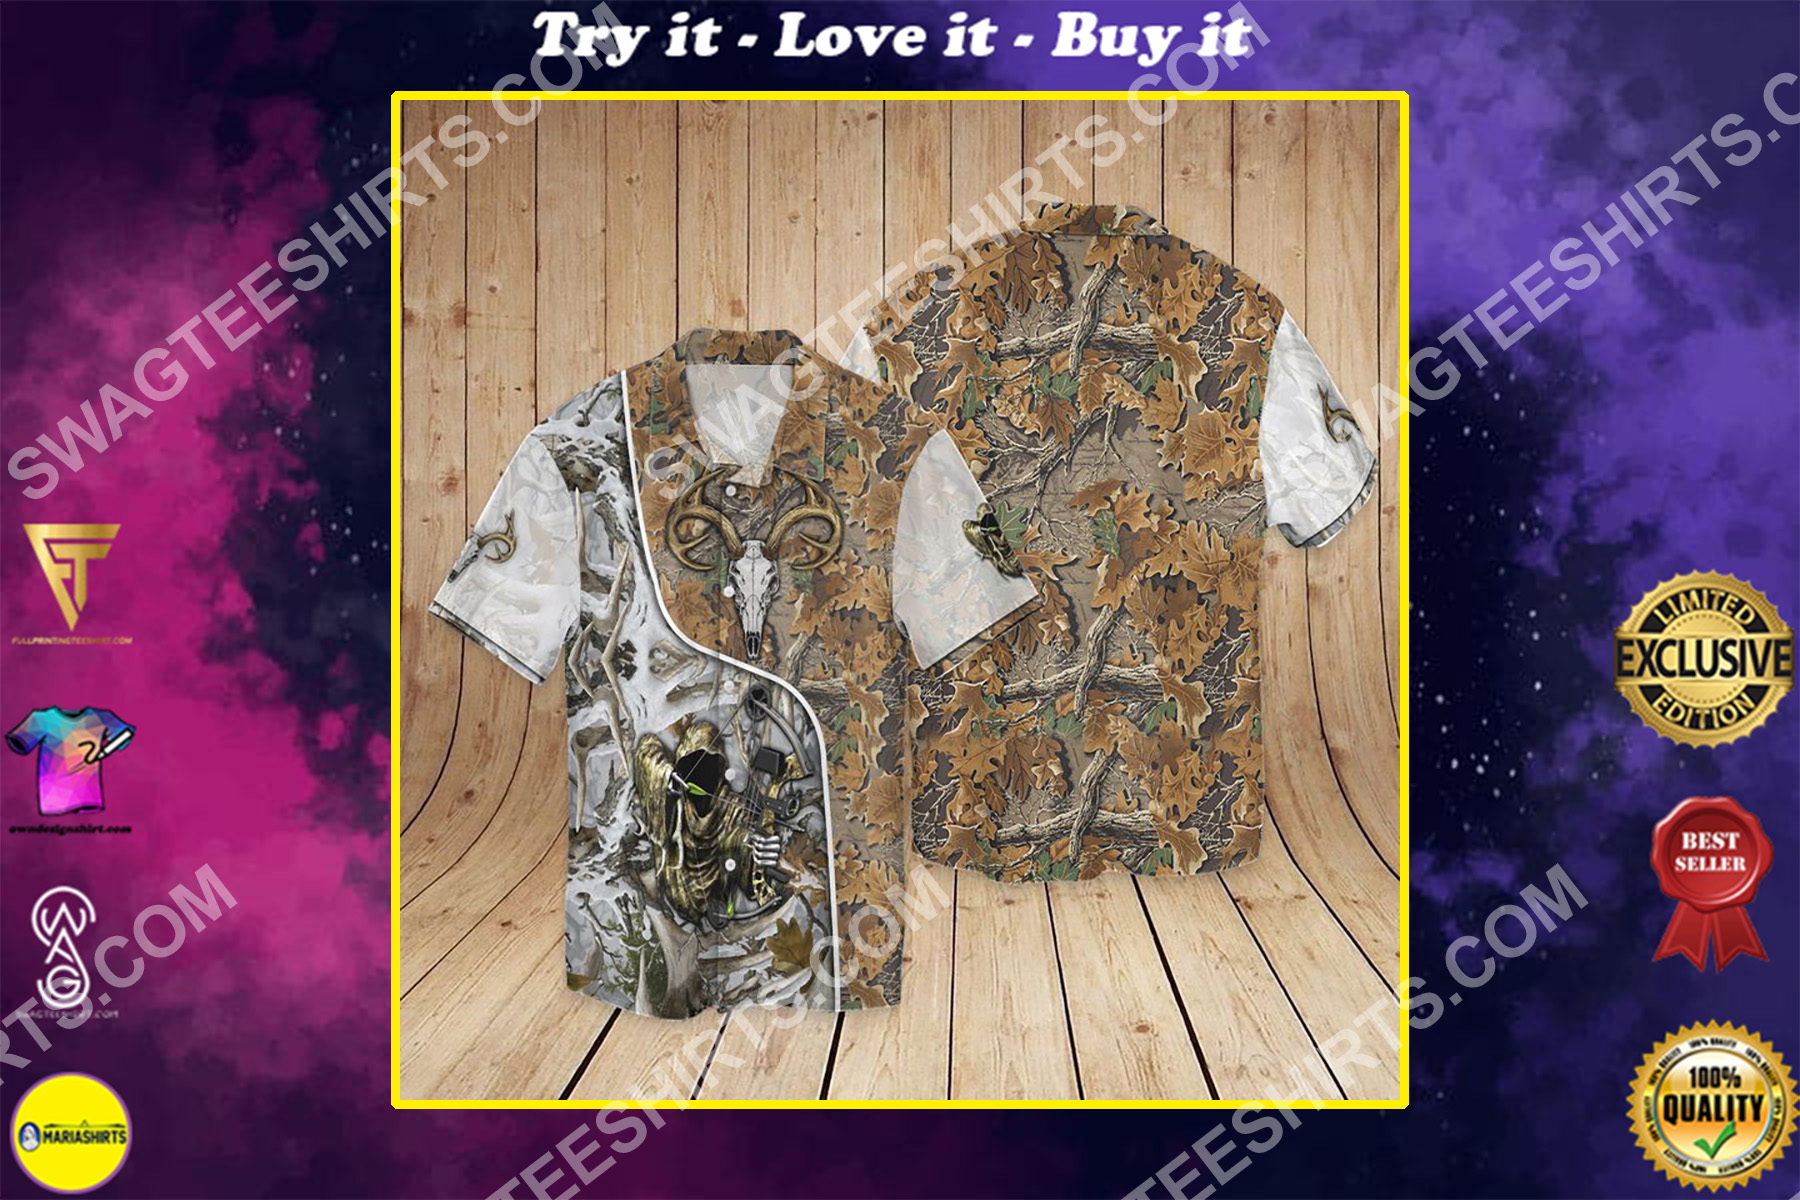 deer hunting all over printed hawaiian shirt